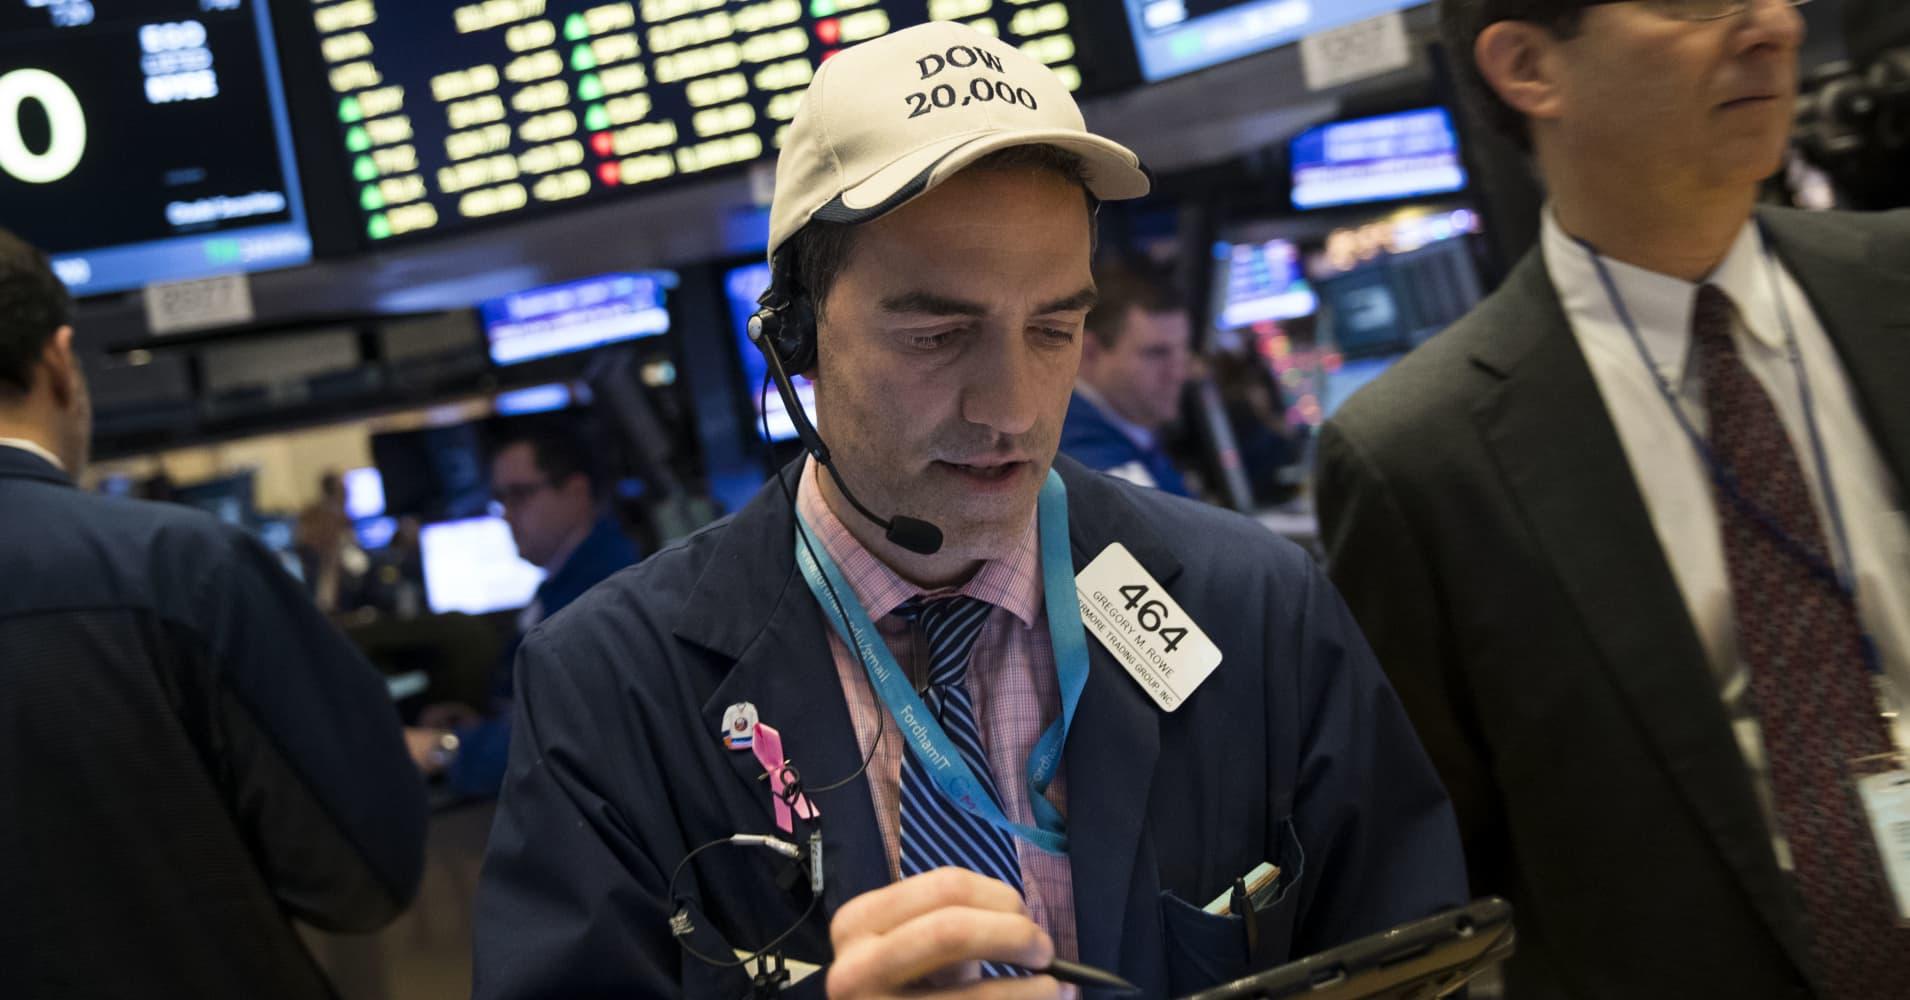 US stocks climb higher as Wall Street awaits health-care vote; financials rise 1%